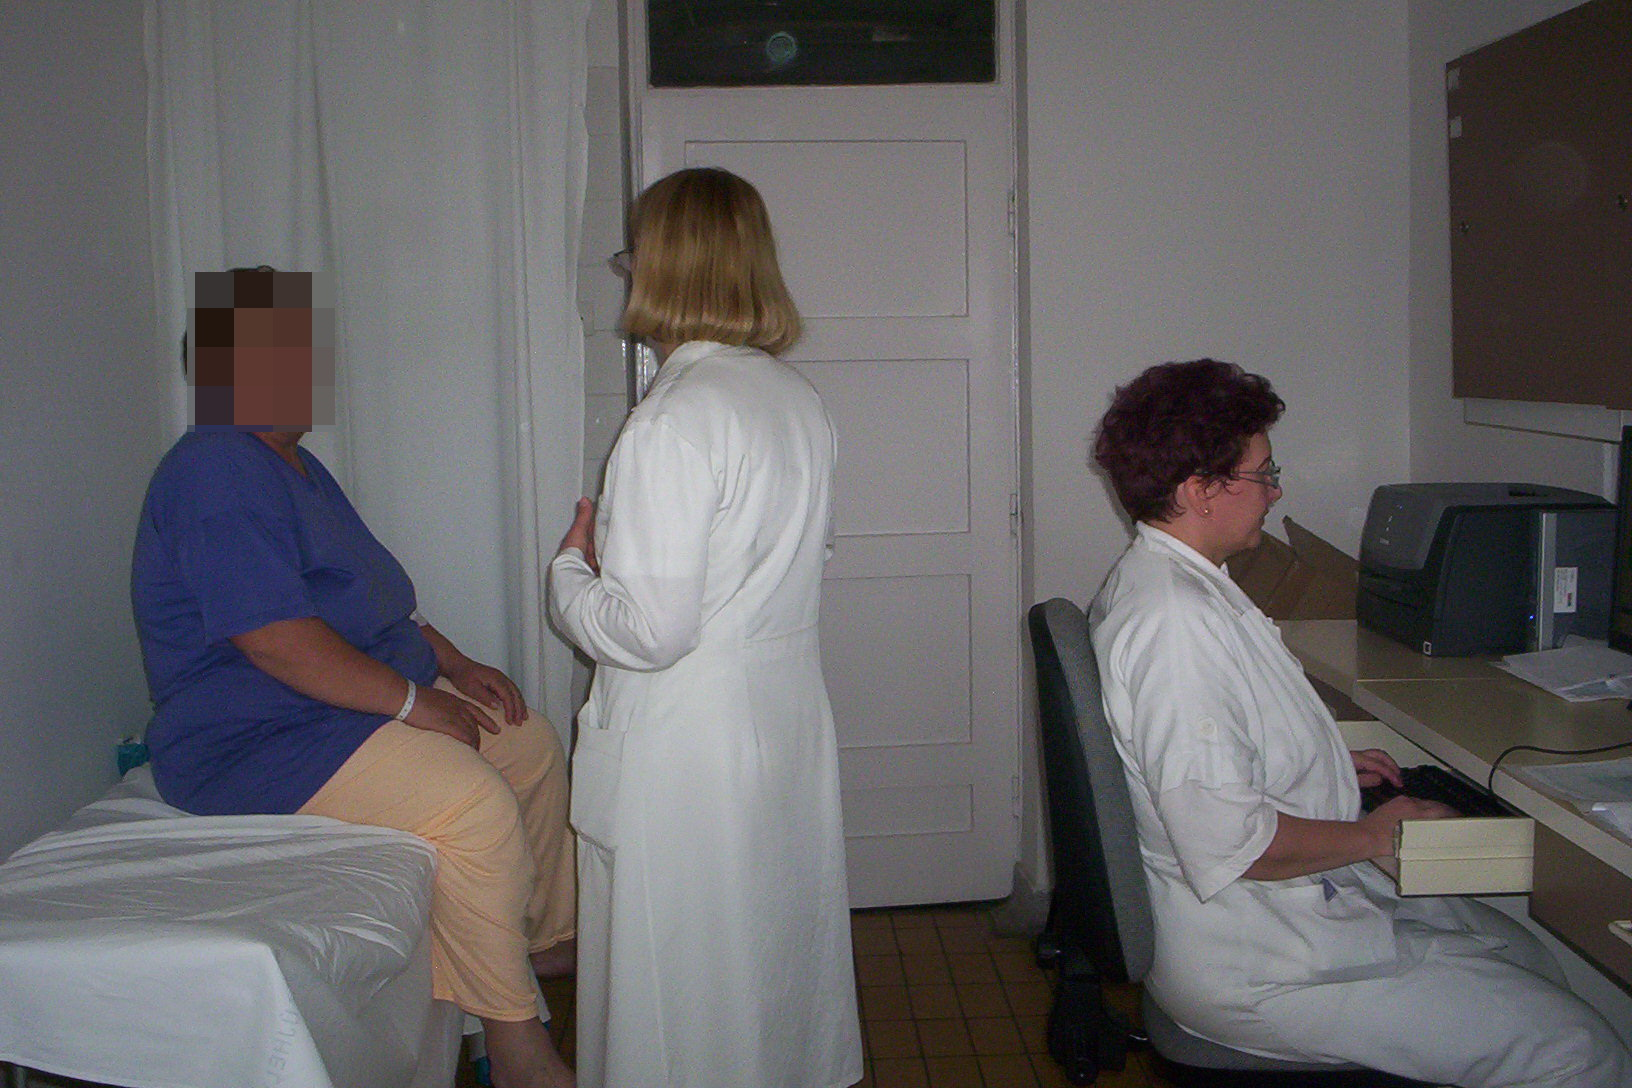 Neurologia 2009-04-08 09-53-57 100_1808 c